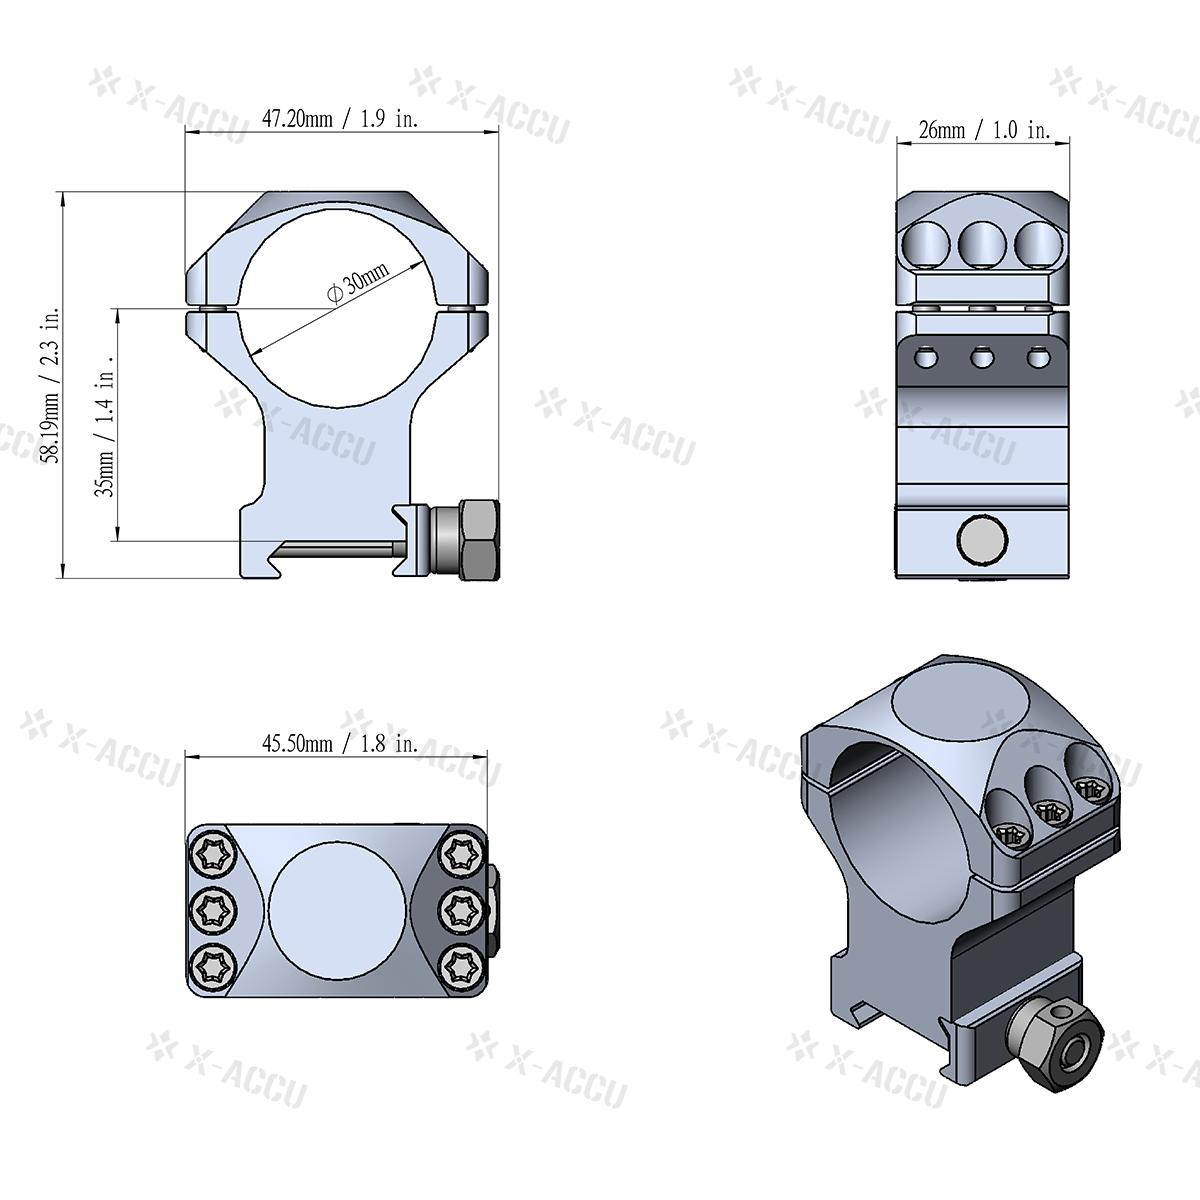 "30mm X-Accu 1.4"" Medium Profile Picatinny Scope Rings Parameter"